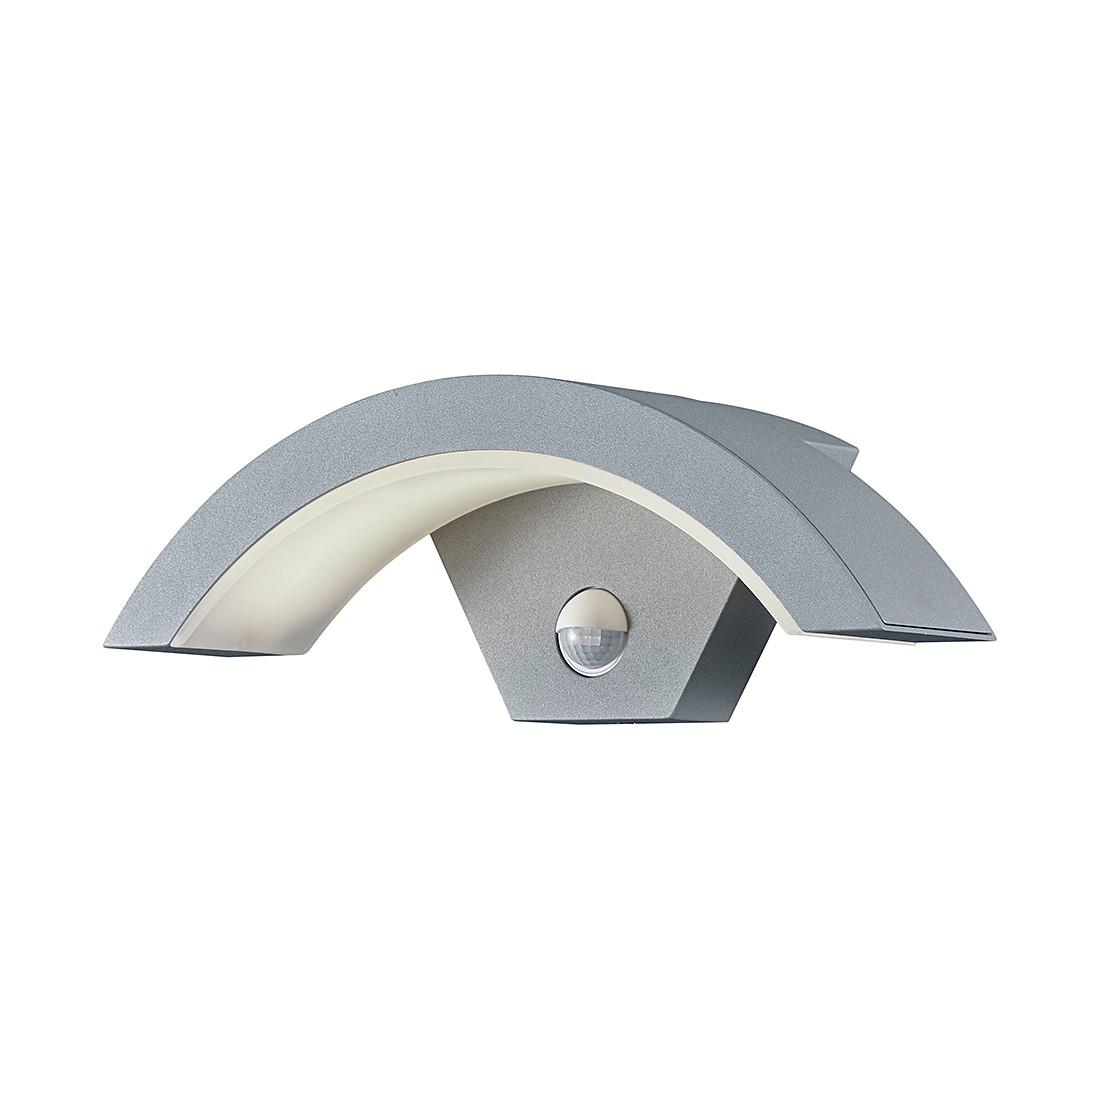 EEK A+, LED-Außenleuchte Ohio 1-flammig - Aluminium Kunststoff - Silber, Trio